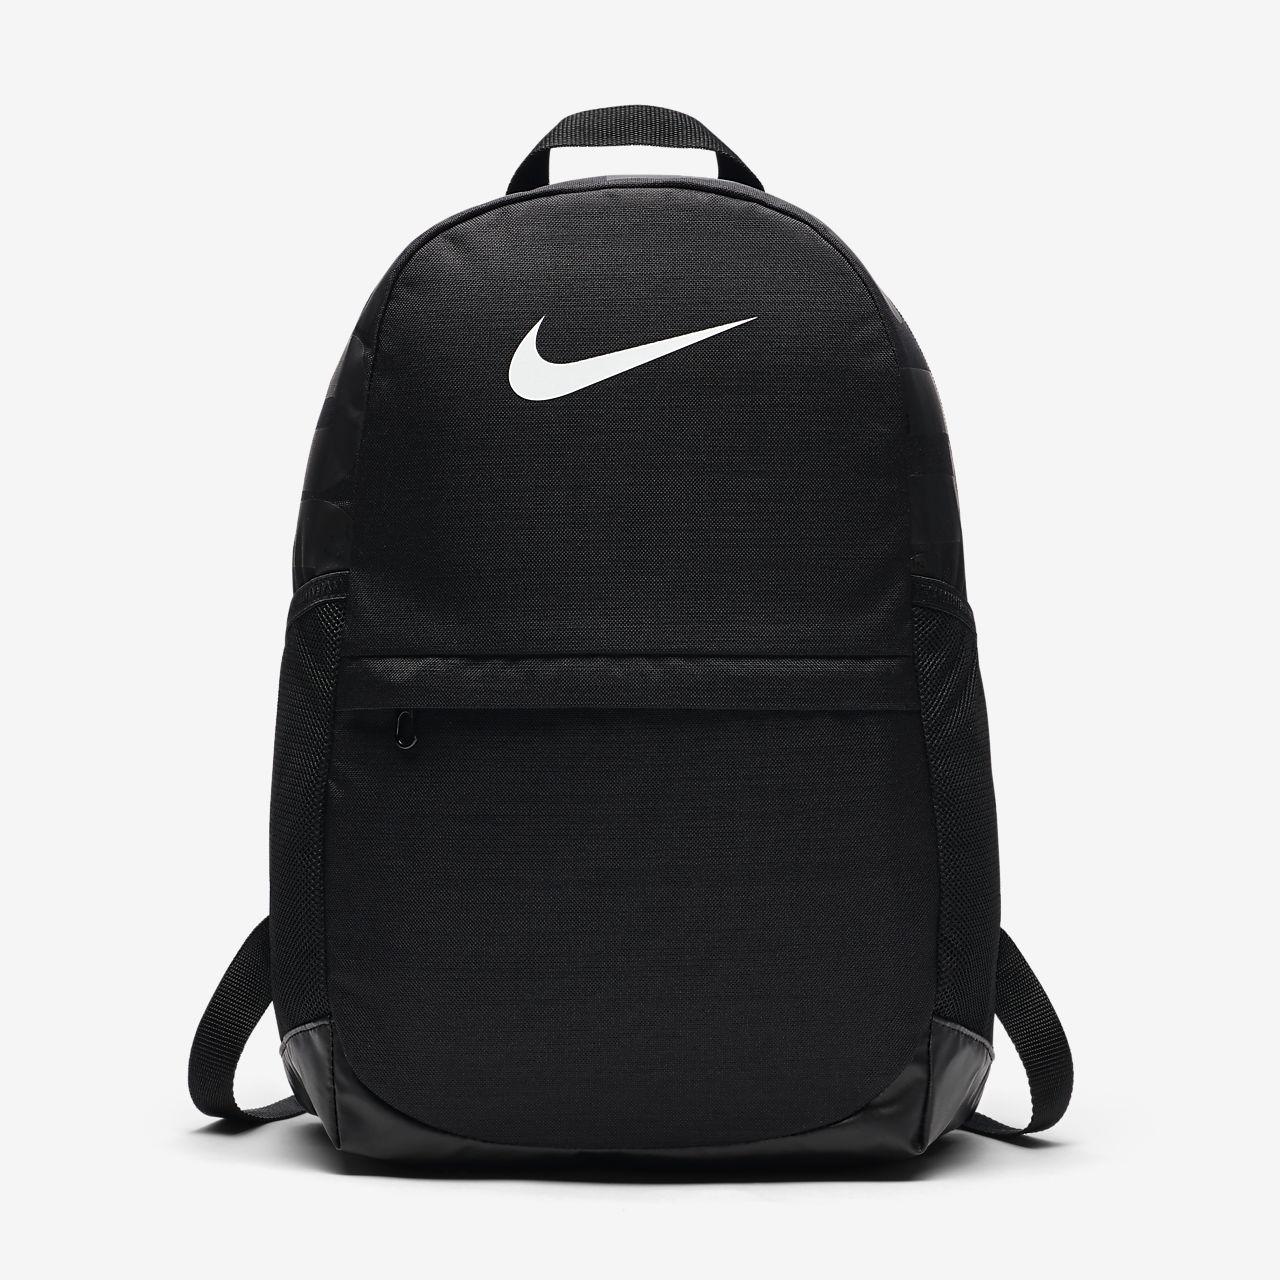 Ryggsäck Nike Brasilia för barn. Nike.com SE 9e2b962e1b445